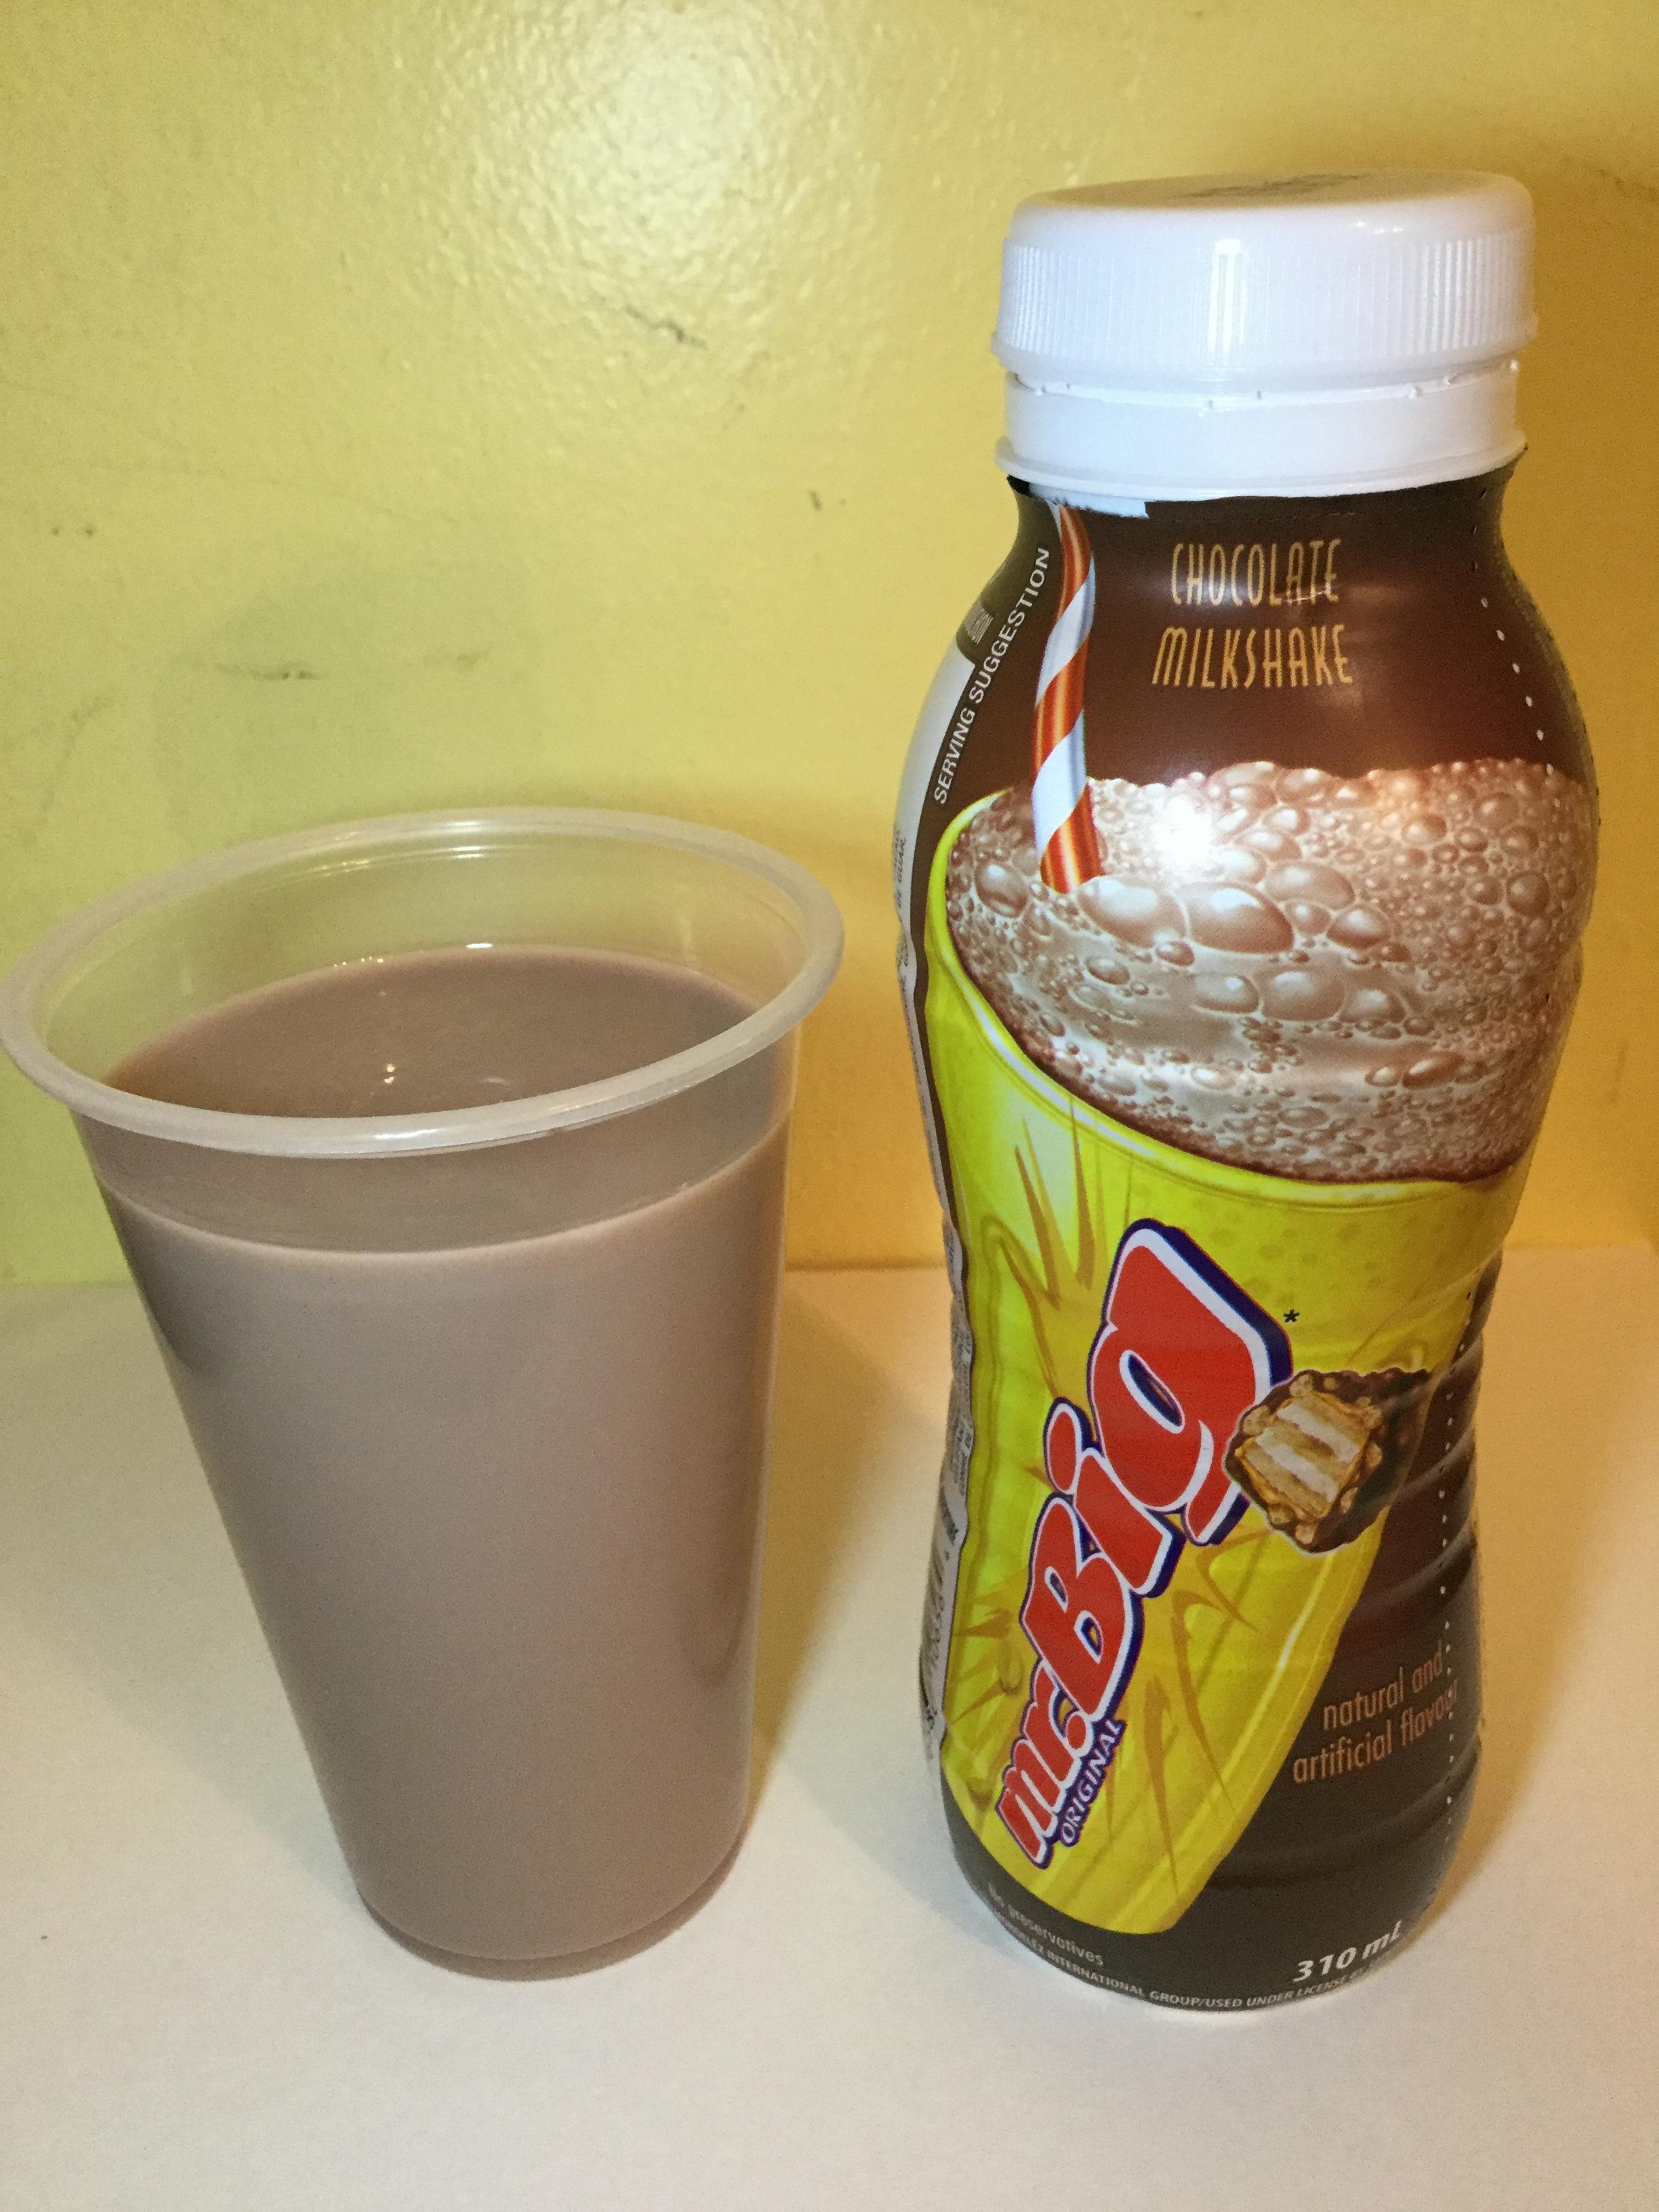 Mr. Big Chocolate Milkshake Cup